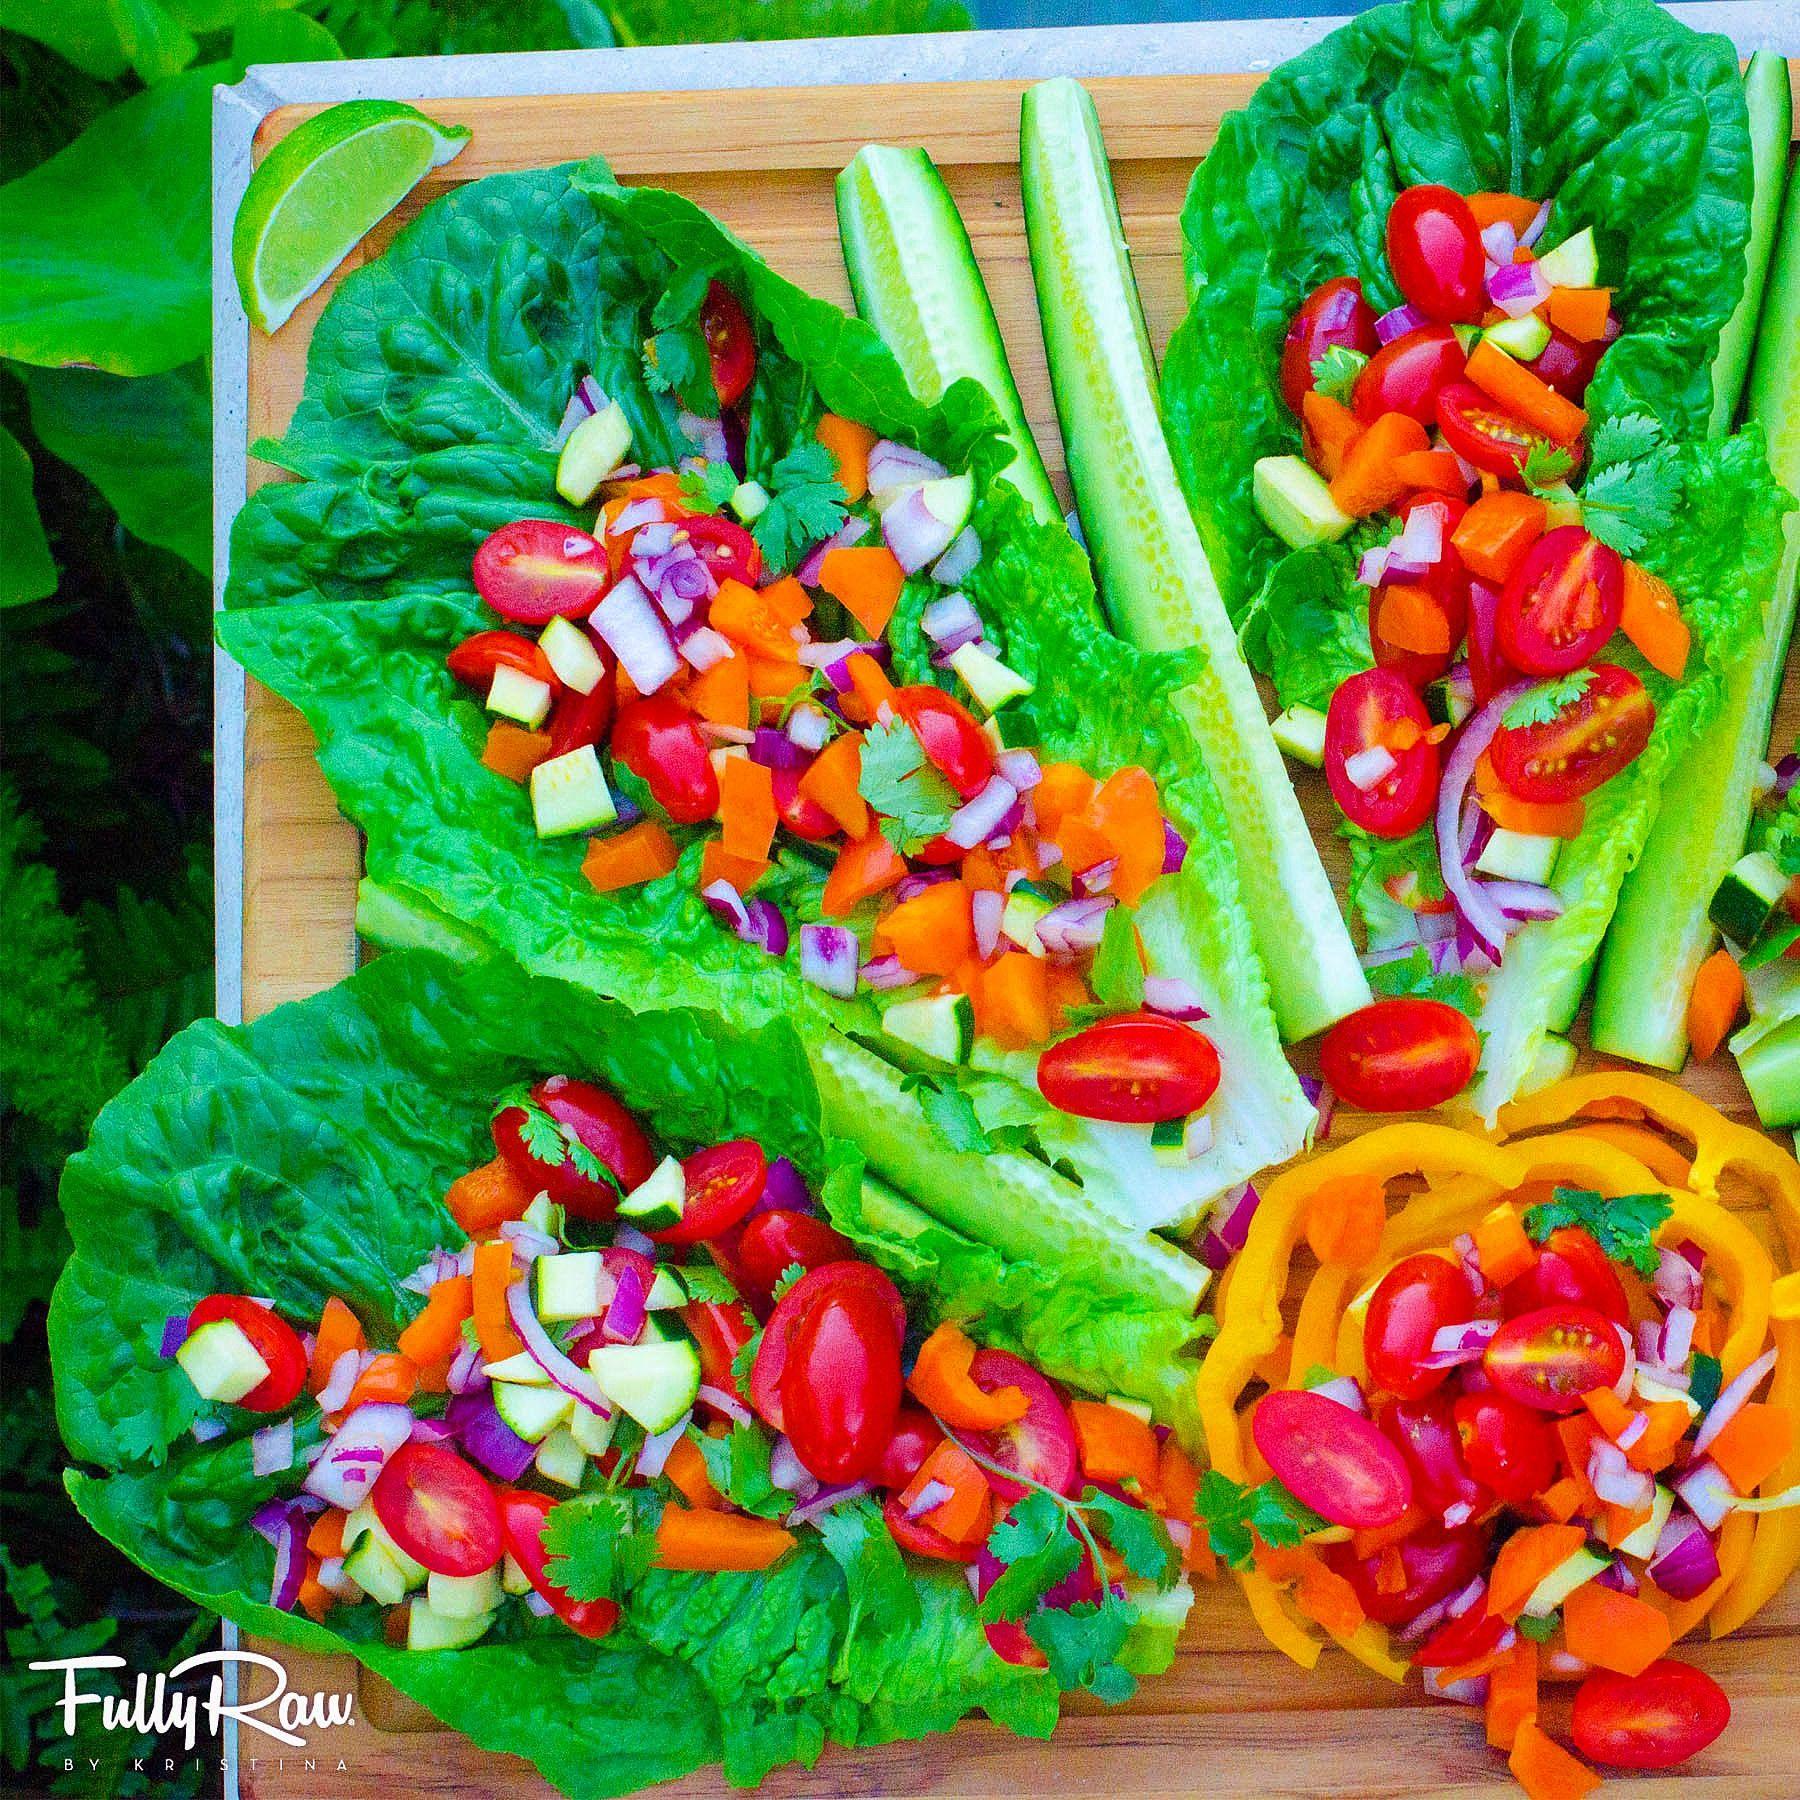 Dynamic Orange Tomato Dressing Video Raw Vegan Recipe: #FullyRaw Tacos! In Honor Of #NationalTacoDay, Sharing